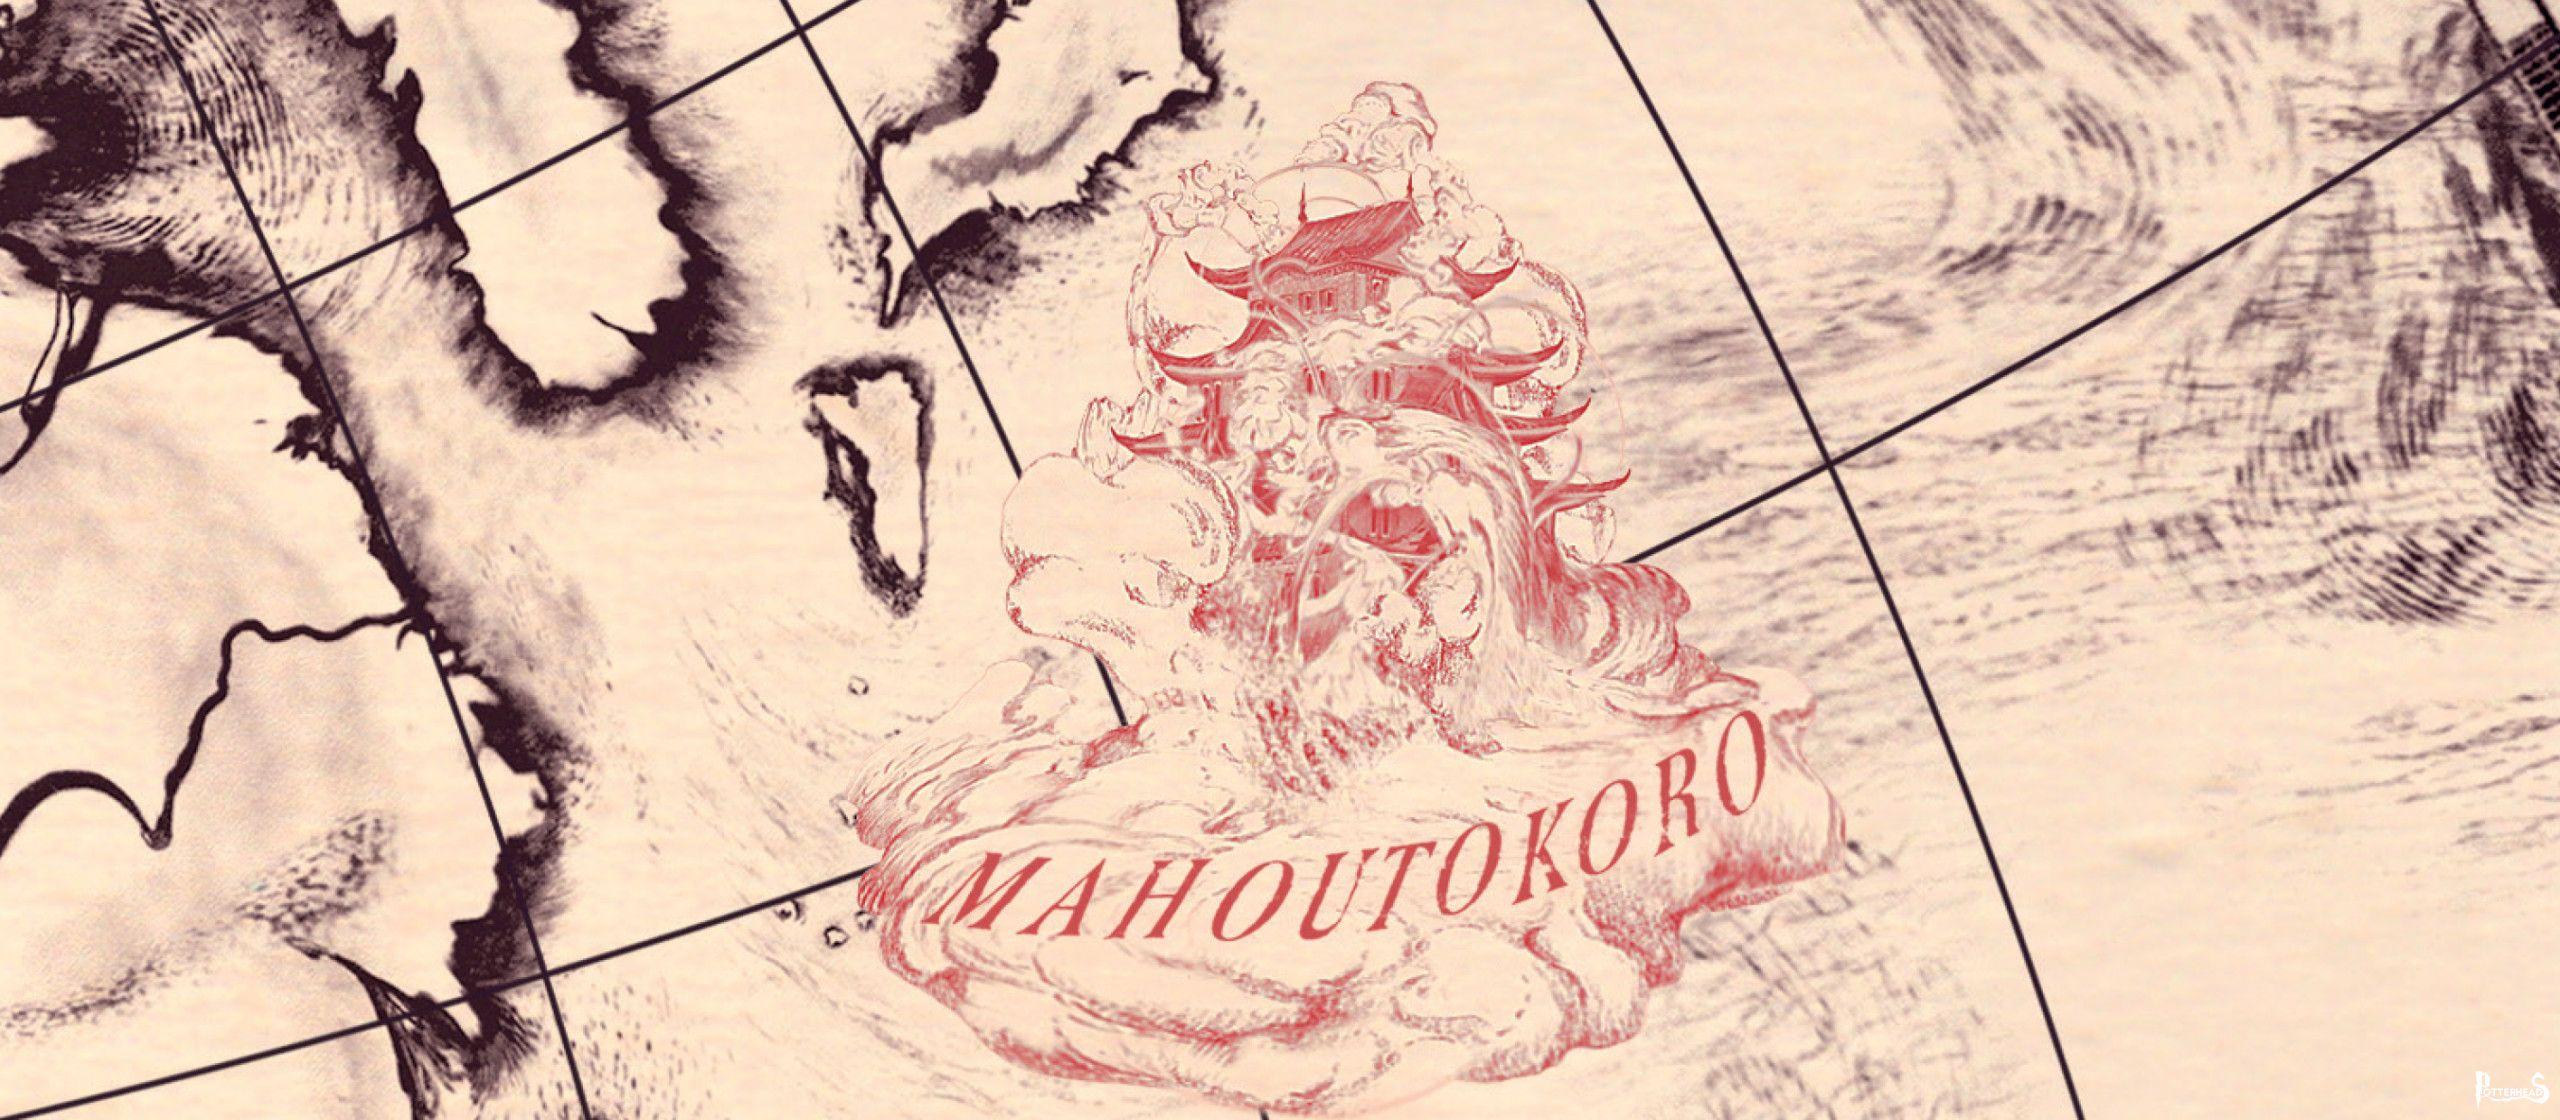 Mahoutokoro Harry Potter - PotterPedia.it